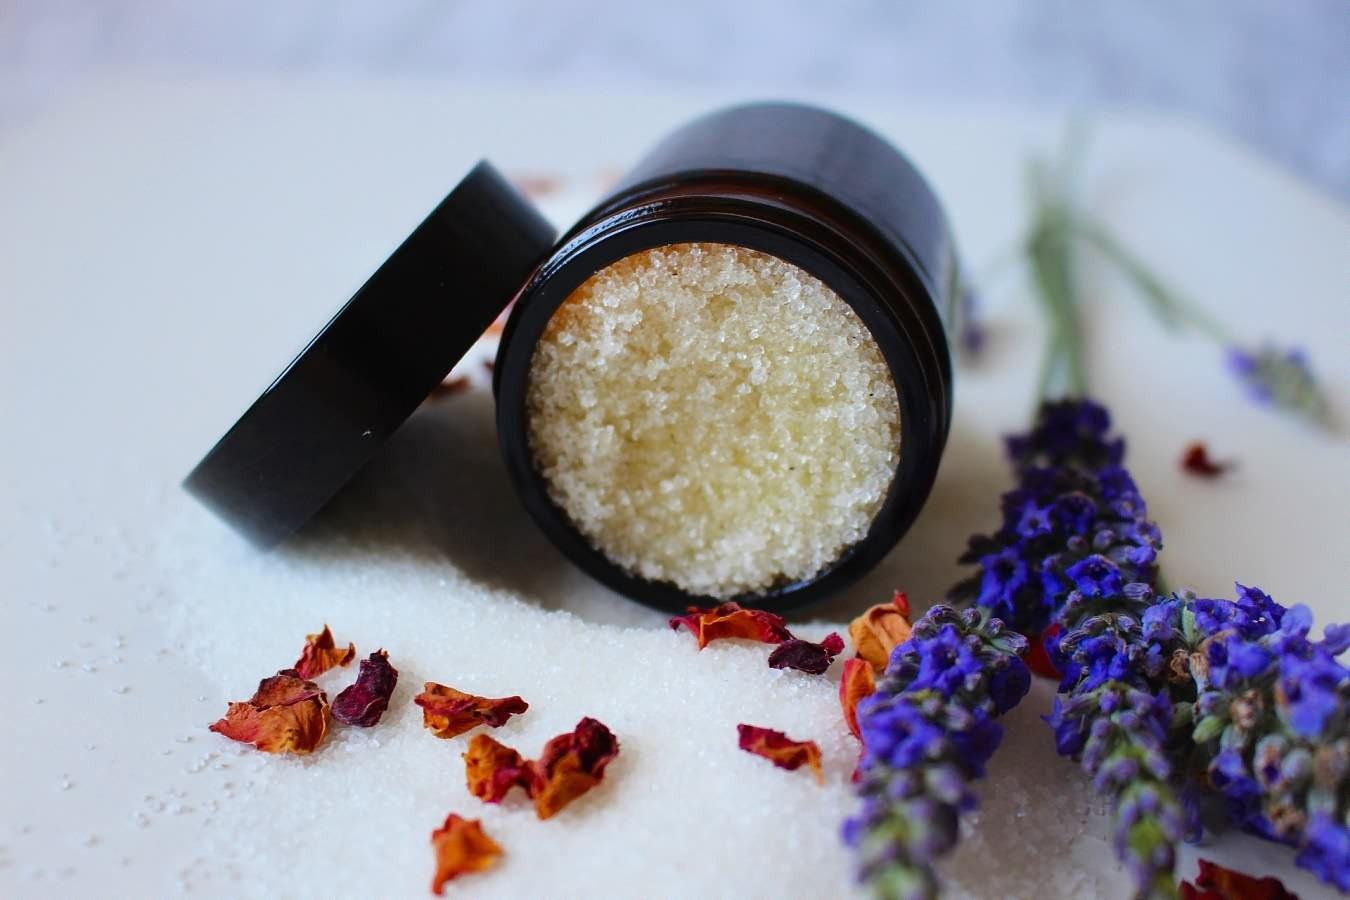 natural-cosmetics-5475877_1920